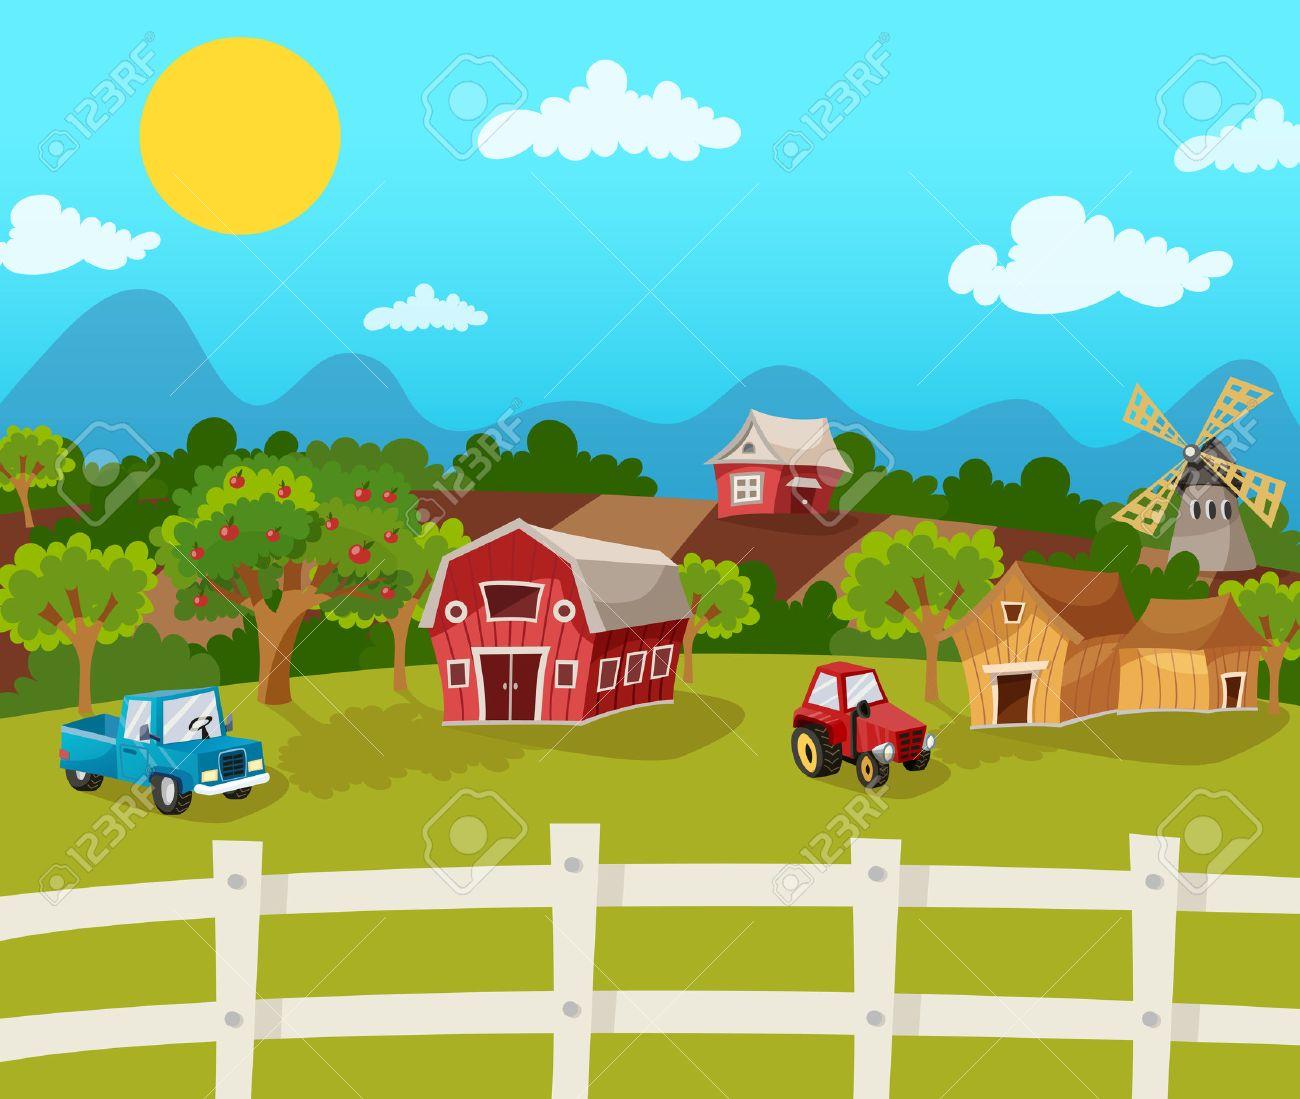 Farm cartoon background with apple garden in rural landscape vector illustration - 42624371